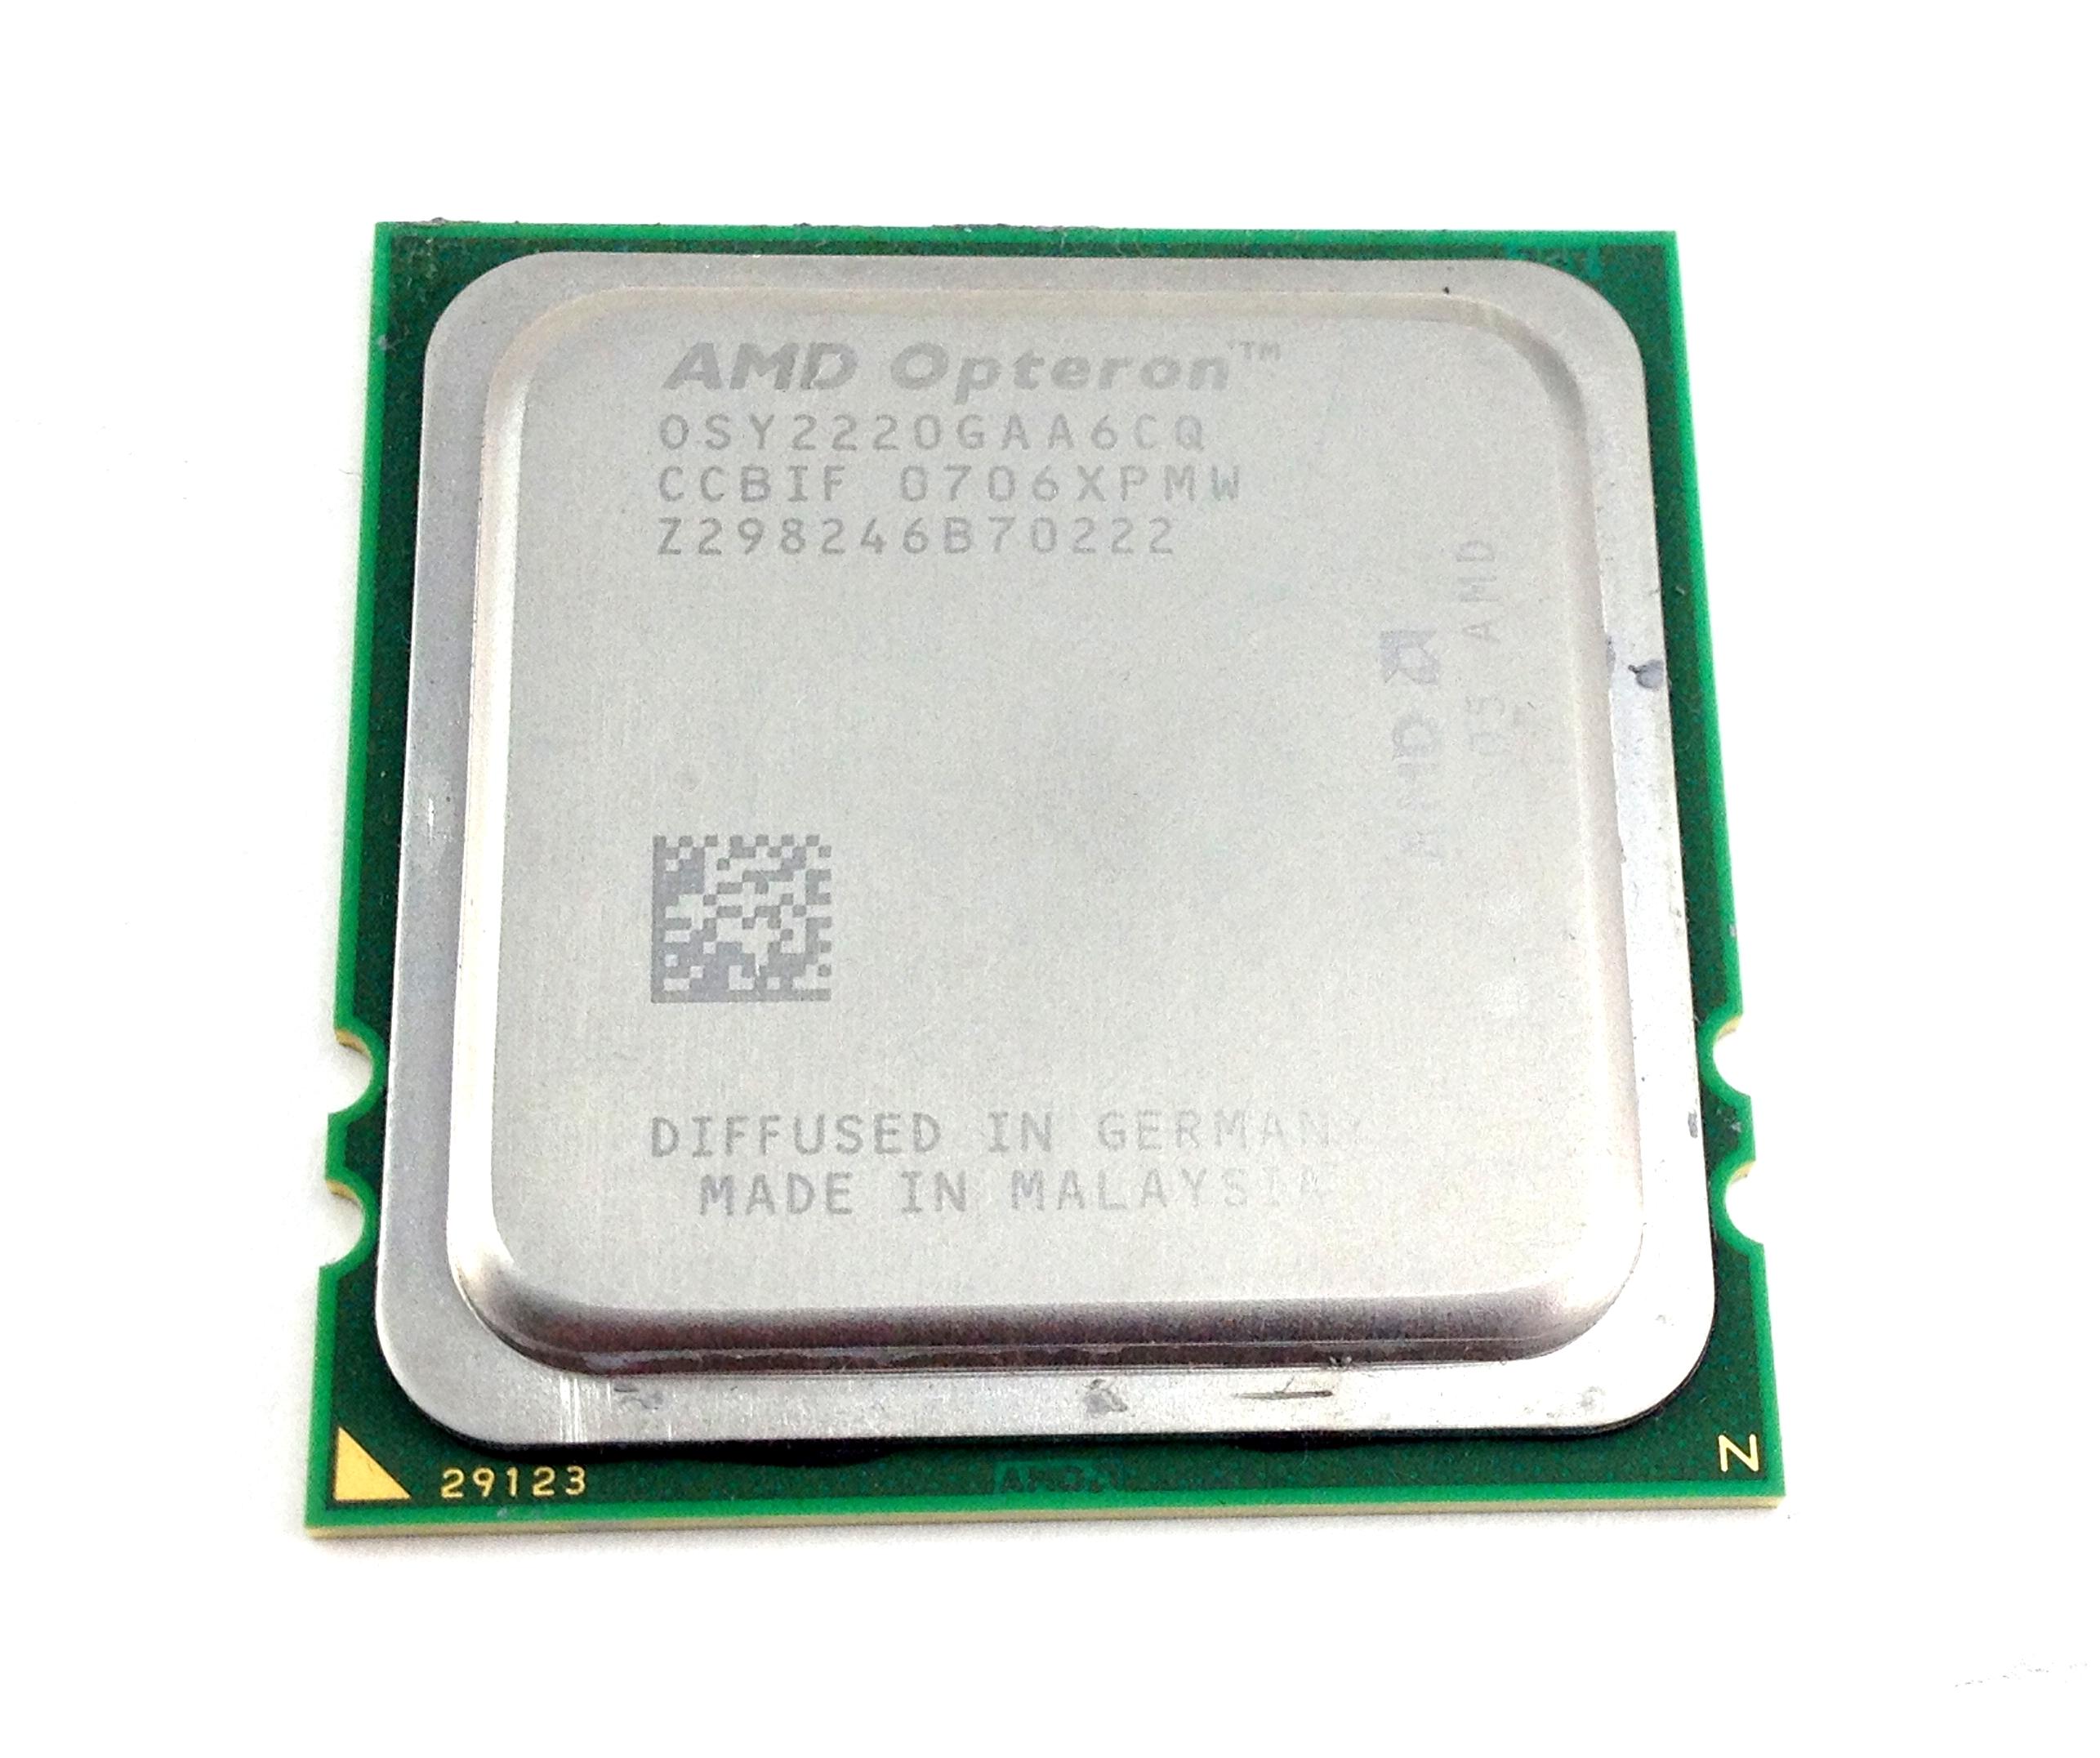 AMD Opteron 2.8GHz 2MB Cache Dual Core Socket F Processor (OSY2220GAA6CQ)